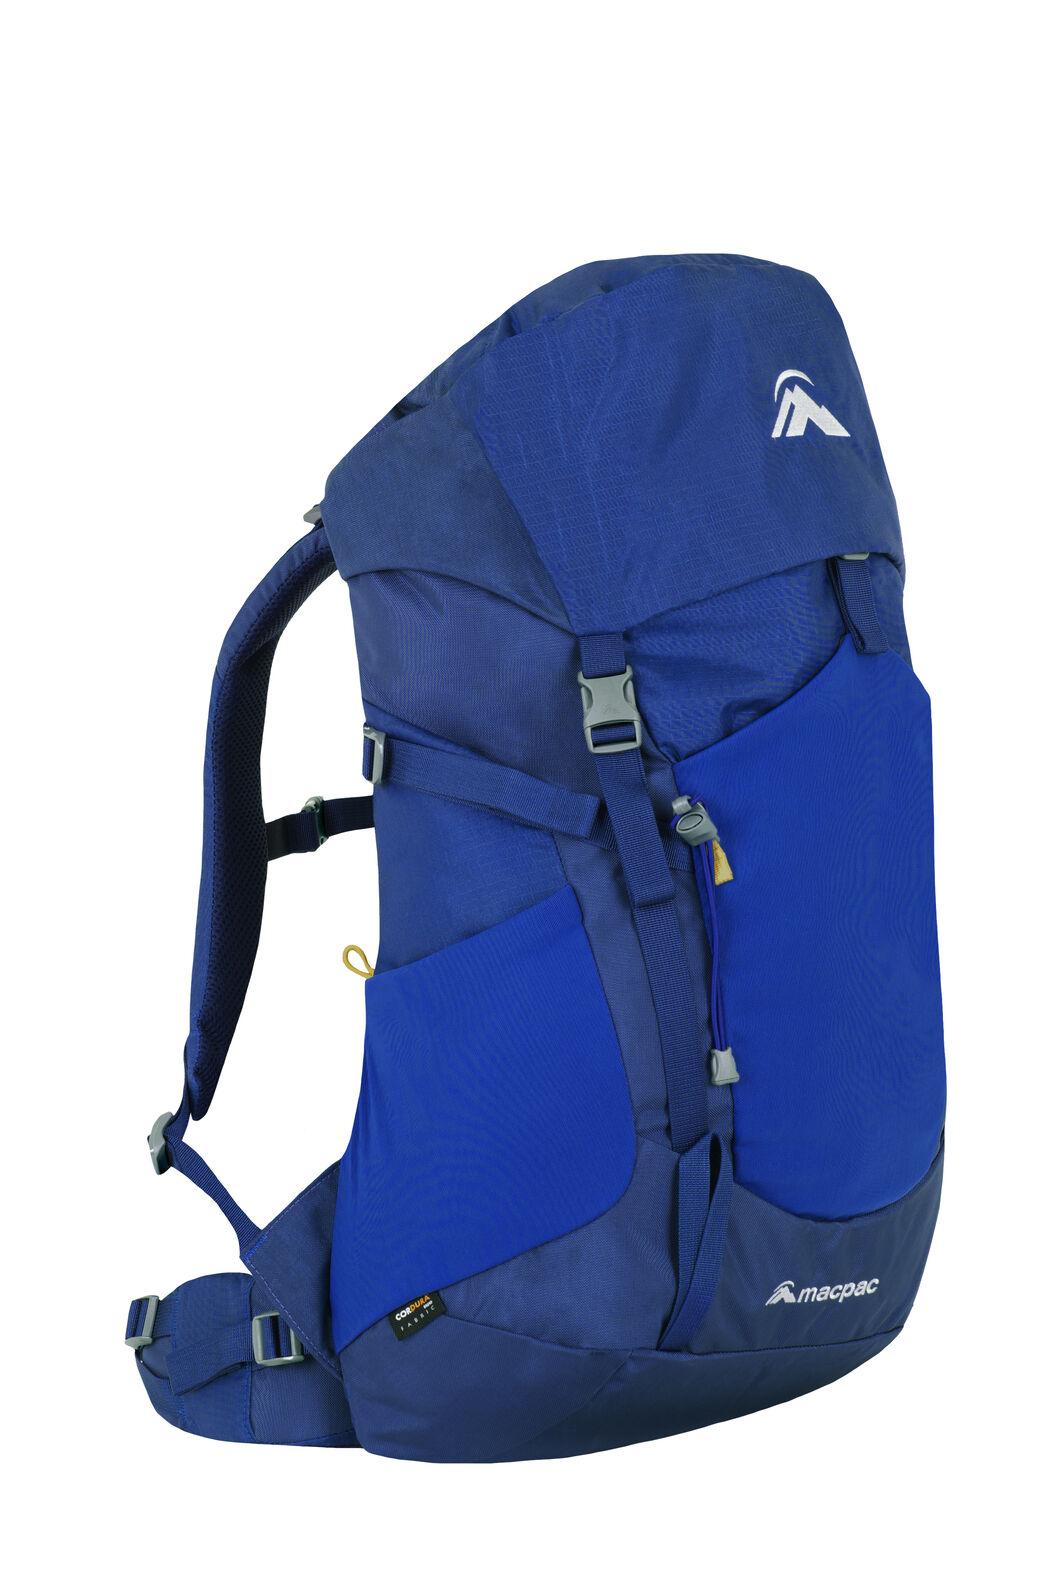 Macpac Torlesse 30L Junior Hiking Pack, Surf The Web, hi-res